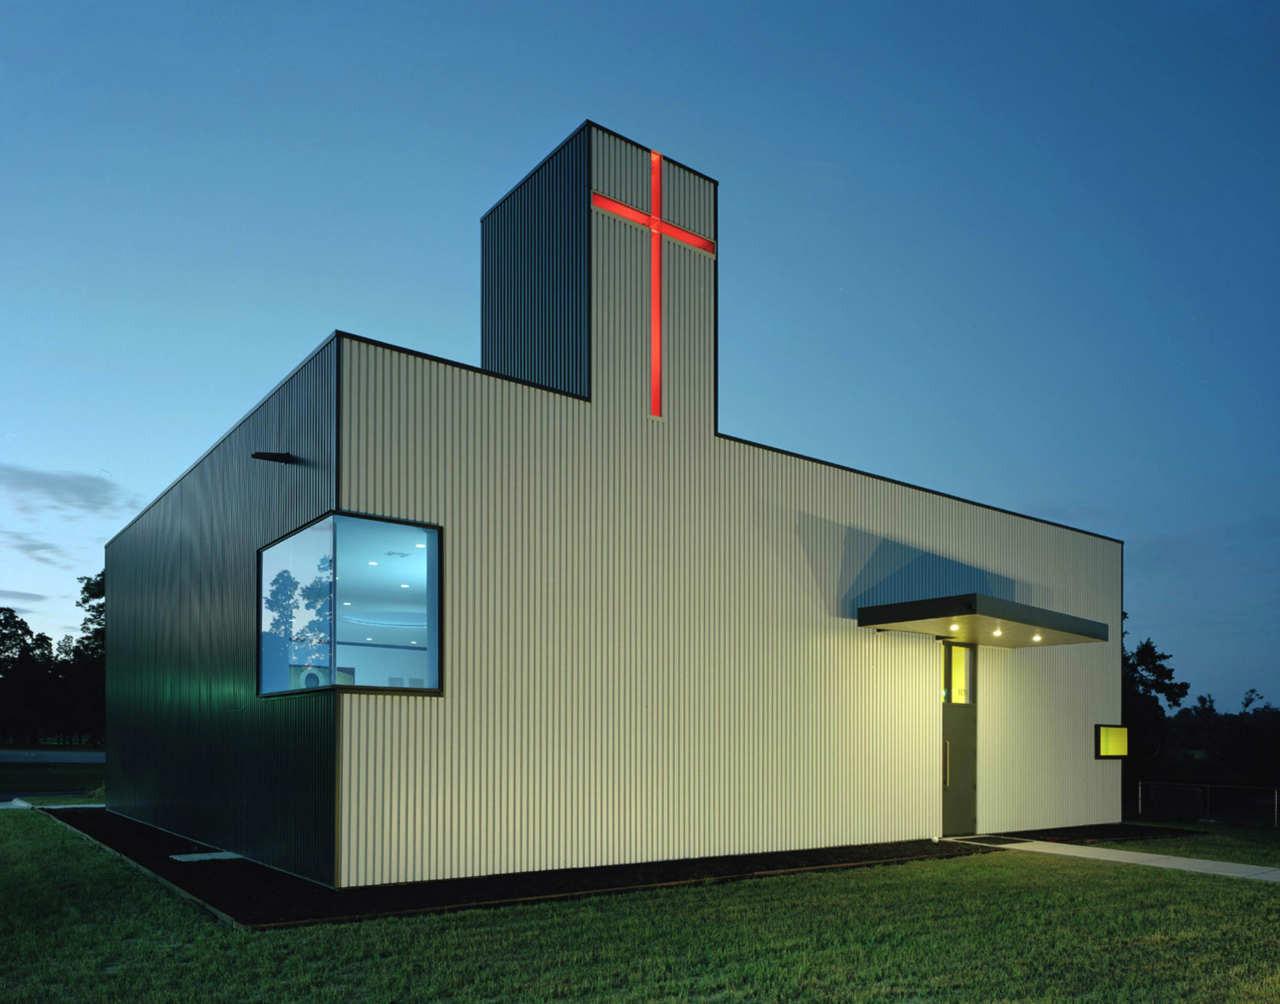 St Nicholas Church / Marlon Blackwell Architect, Courtesy of Marlon Blackwell Architect